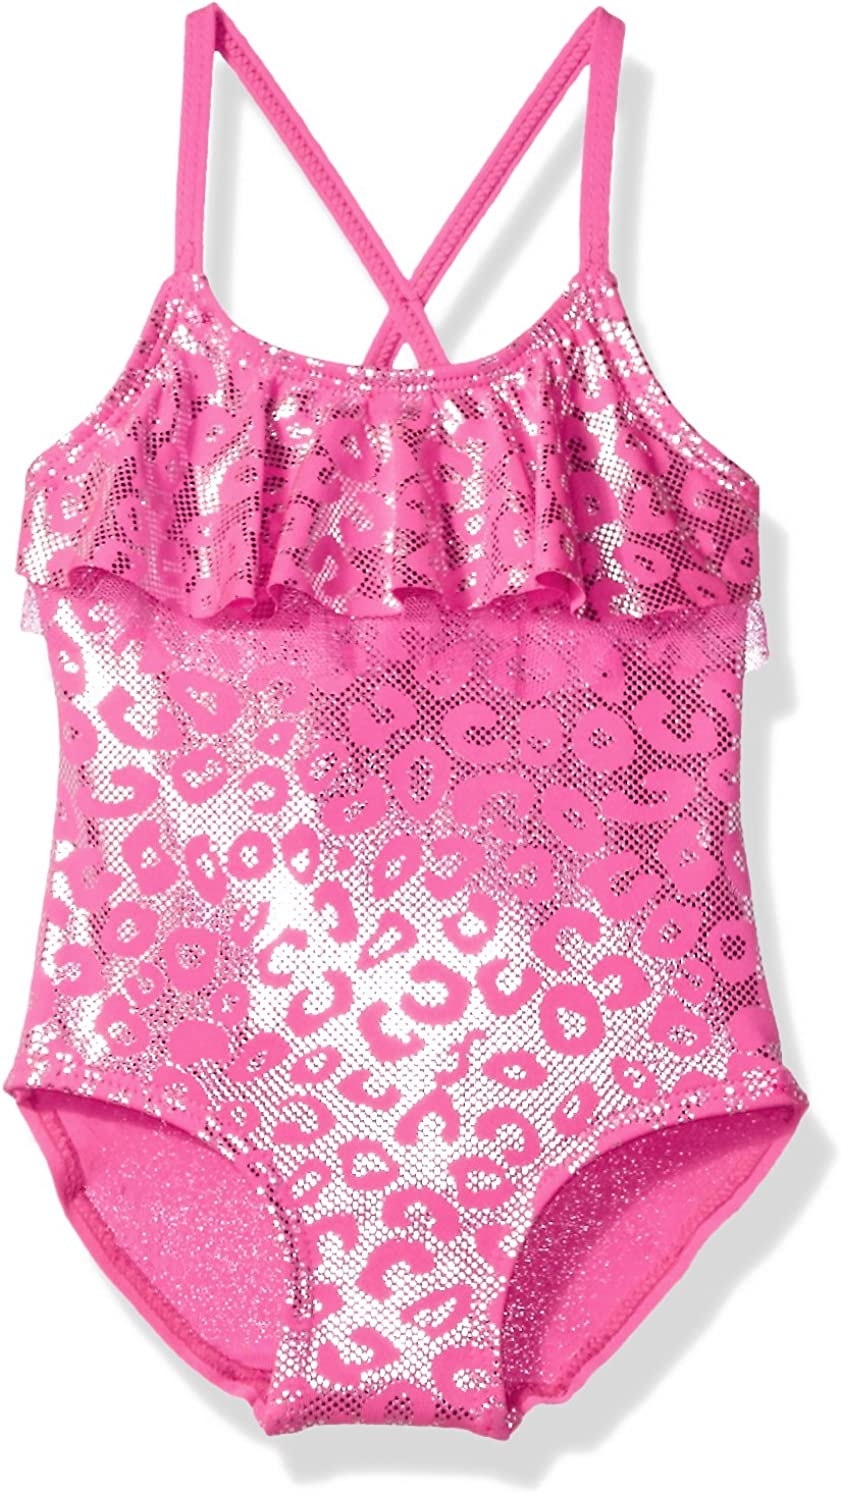 Pink Platinum Girls Inf Foil Cheetah Print One Piece Swimsuit